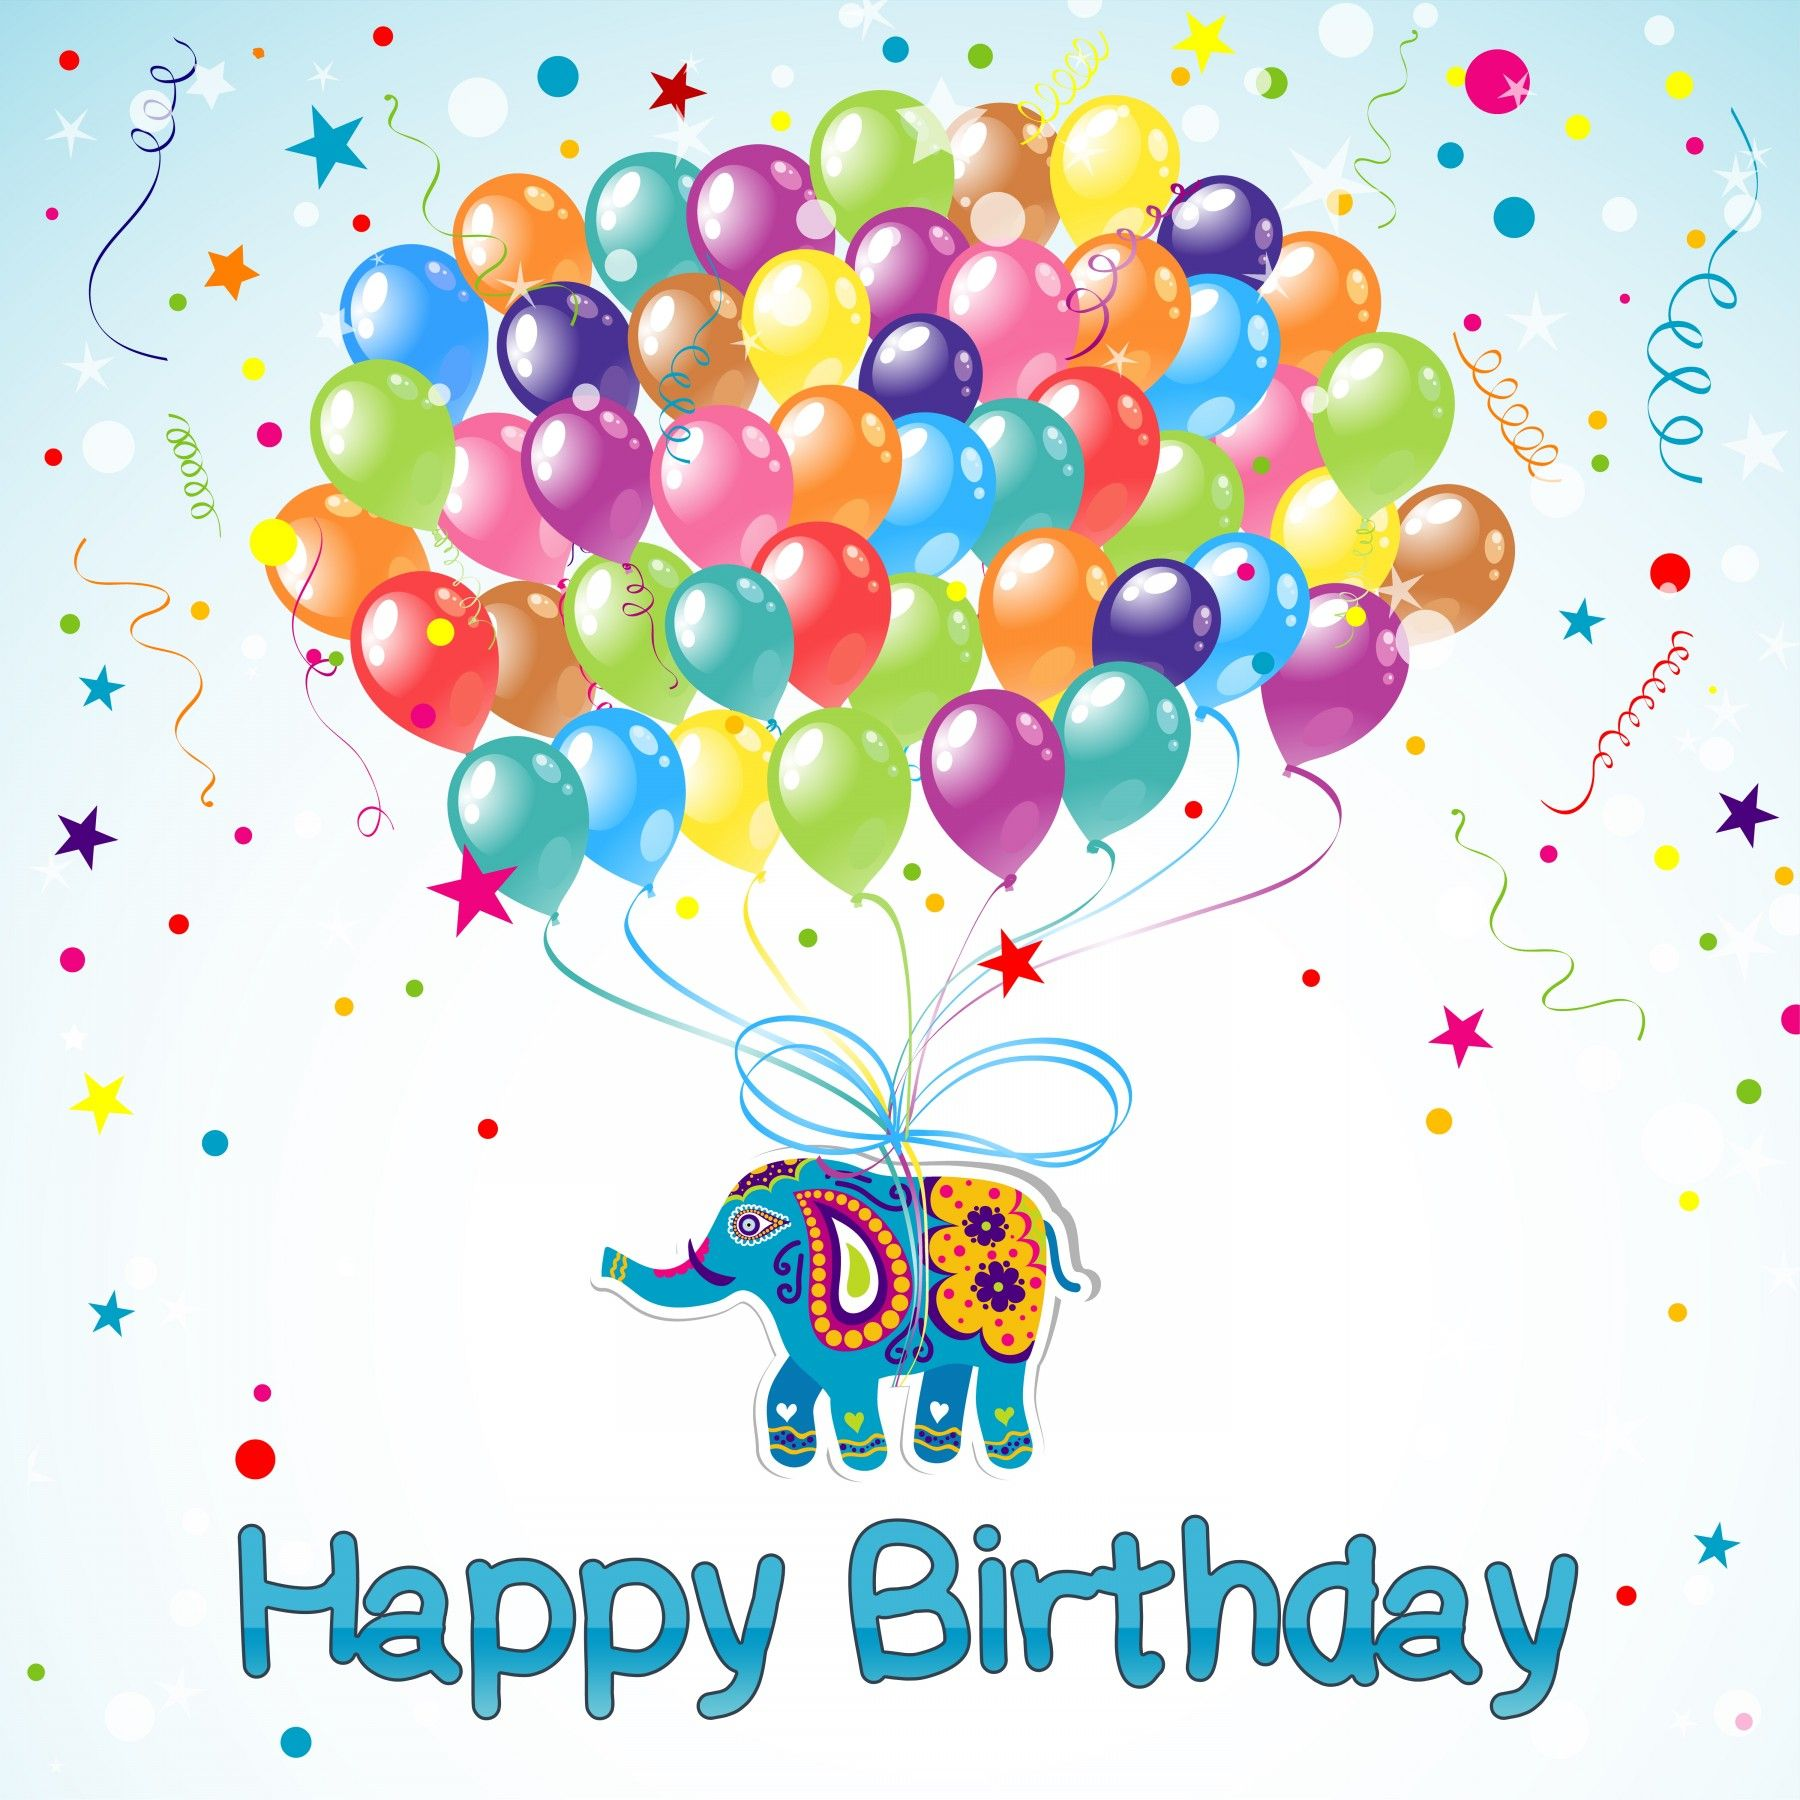 Happy birthday cards photo stock happy birthday images pinterest happy birthday cards photo stock bookmarktalkfo Choice Image